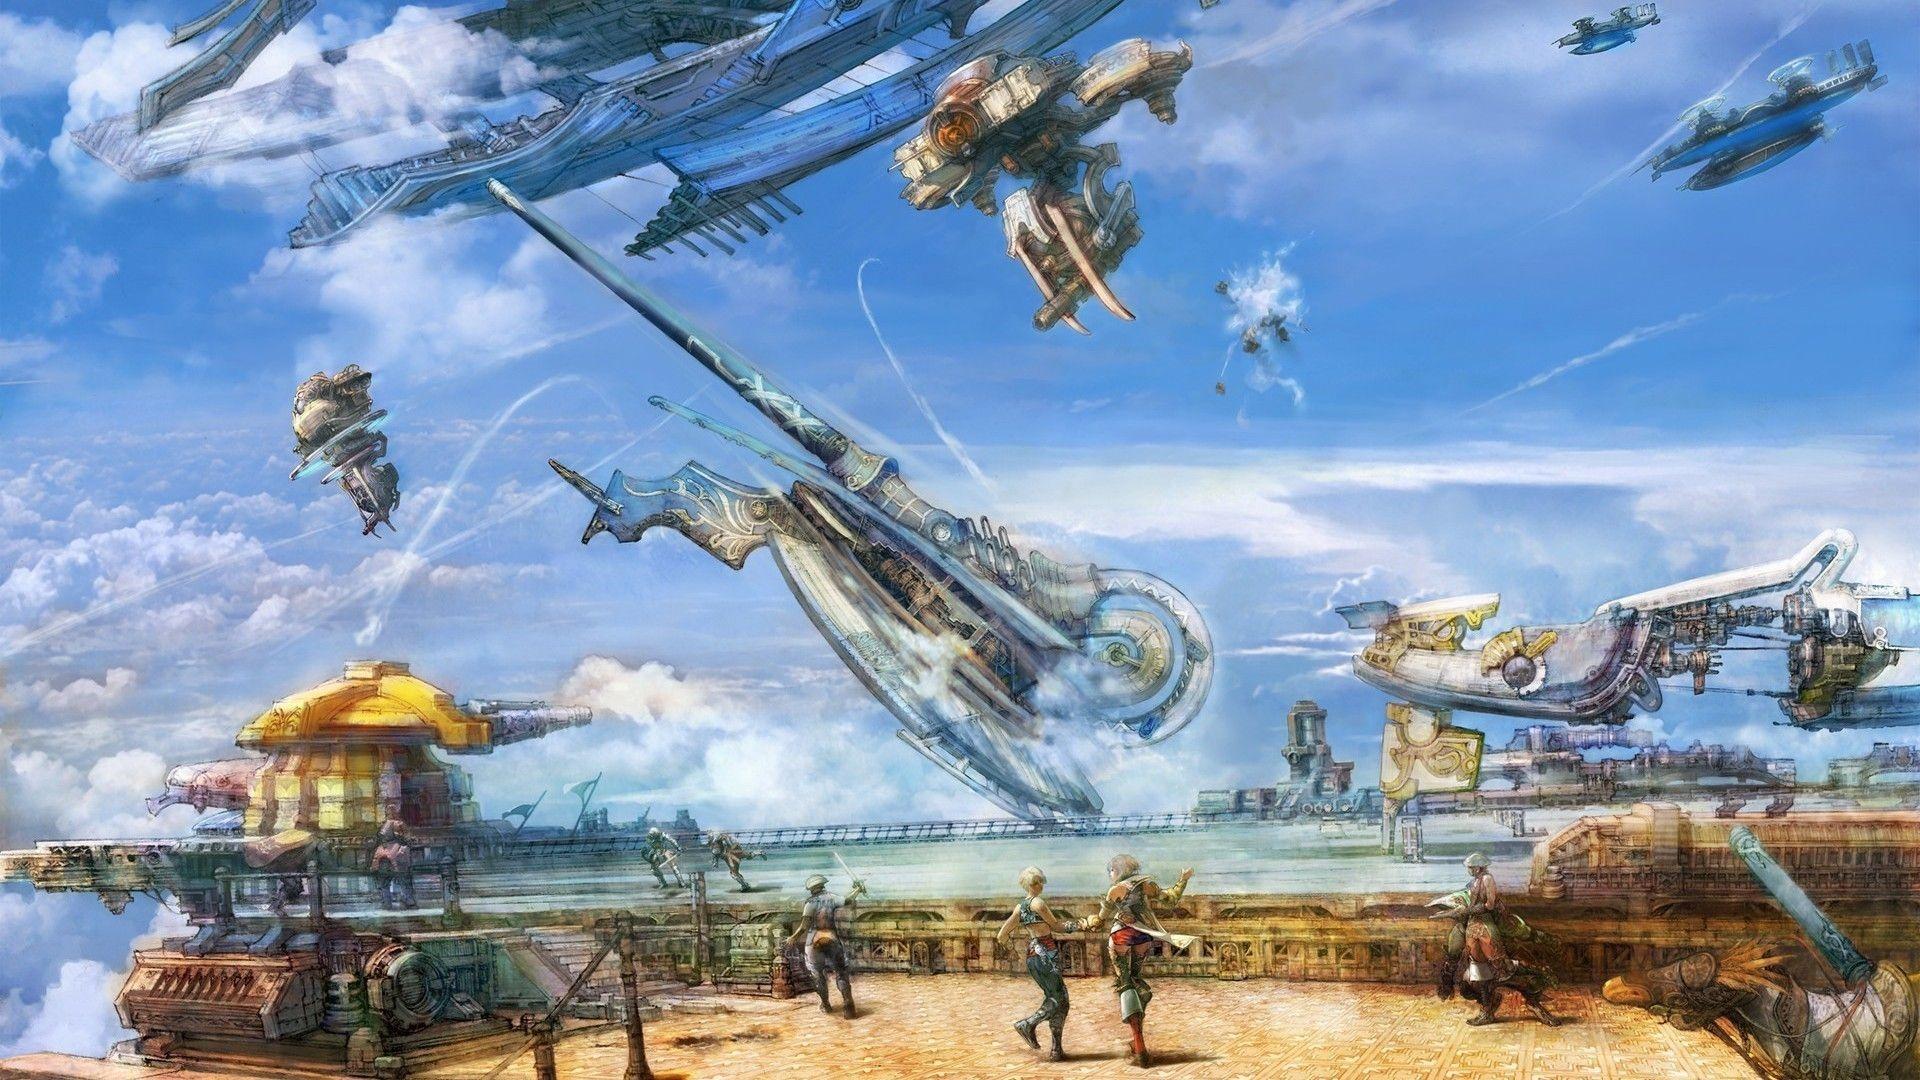 Final Fantasy free wallpaper